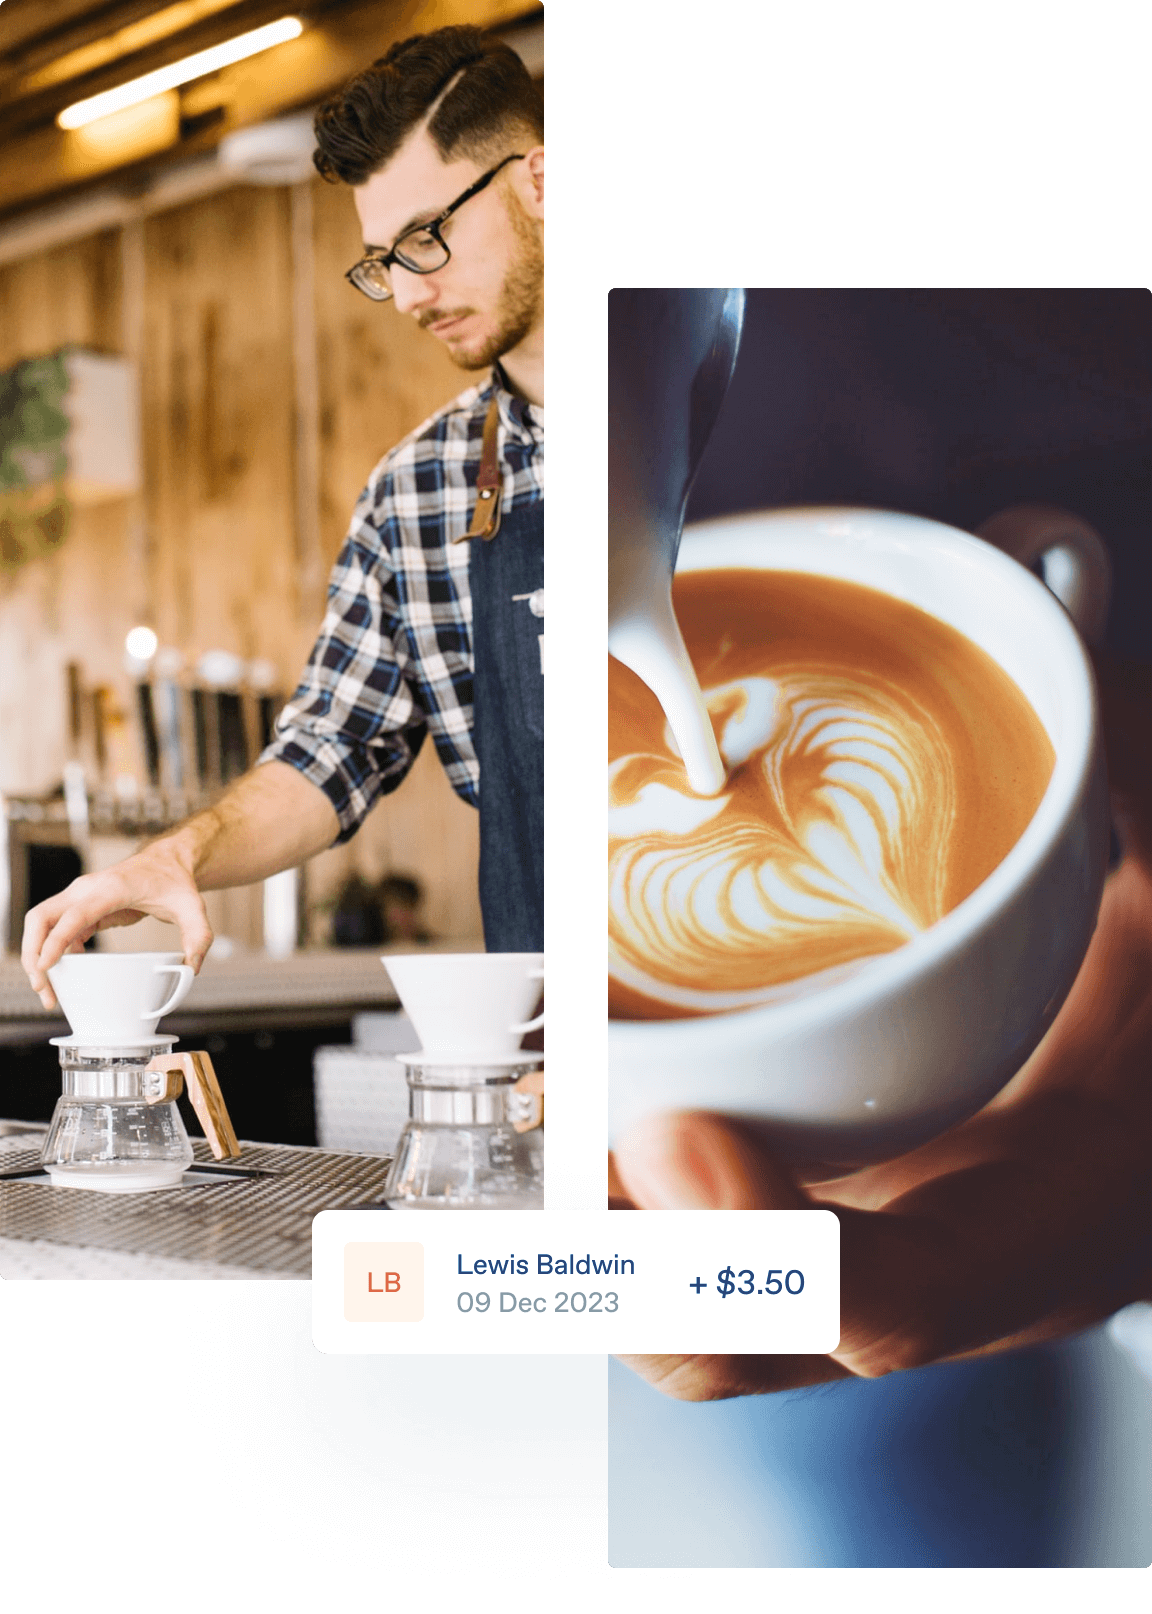 Cafe owner uses Zeller at his business.